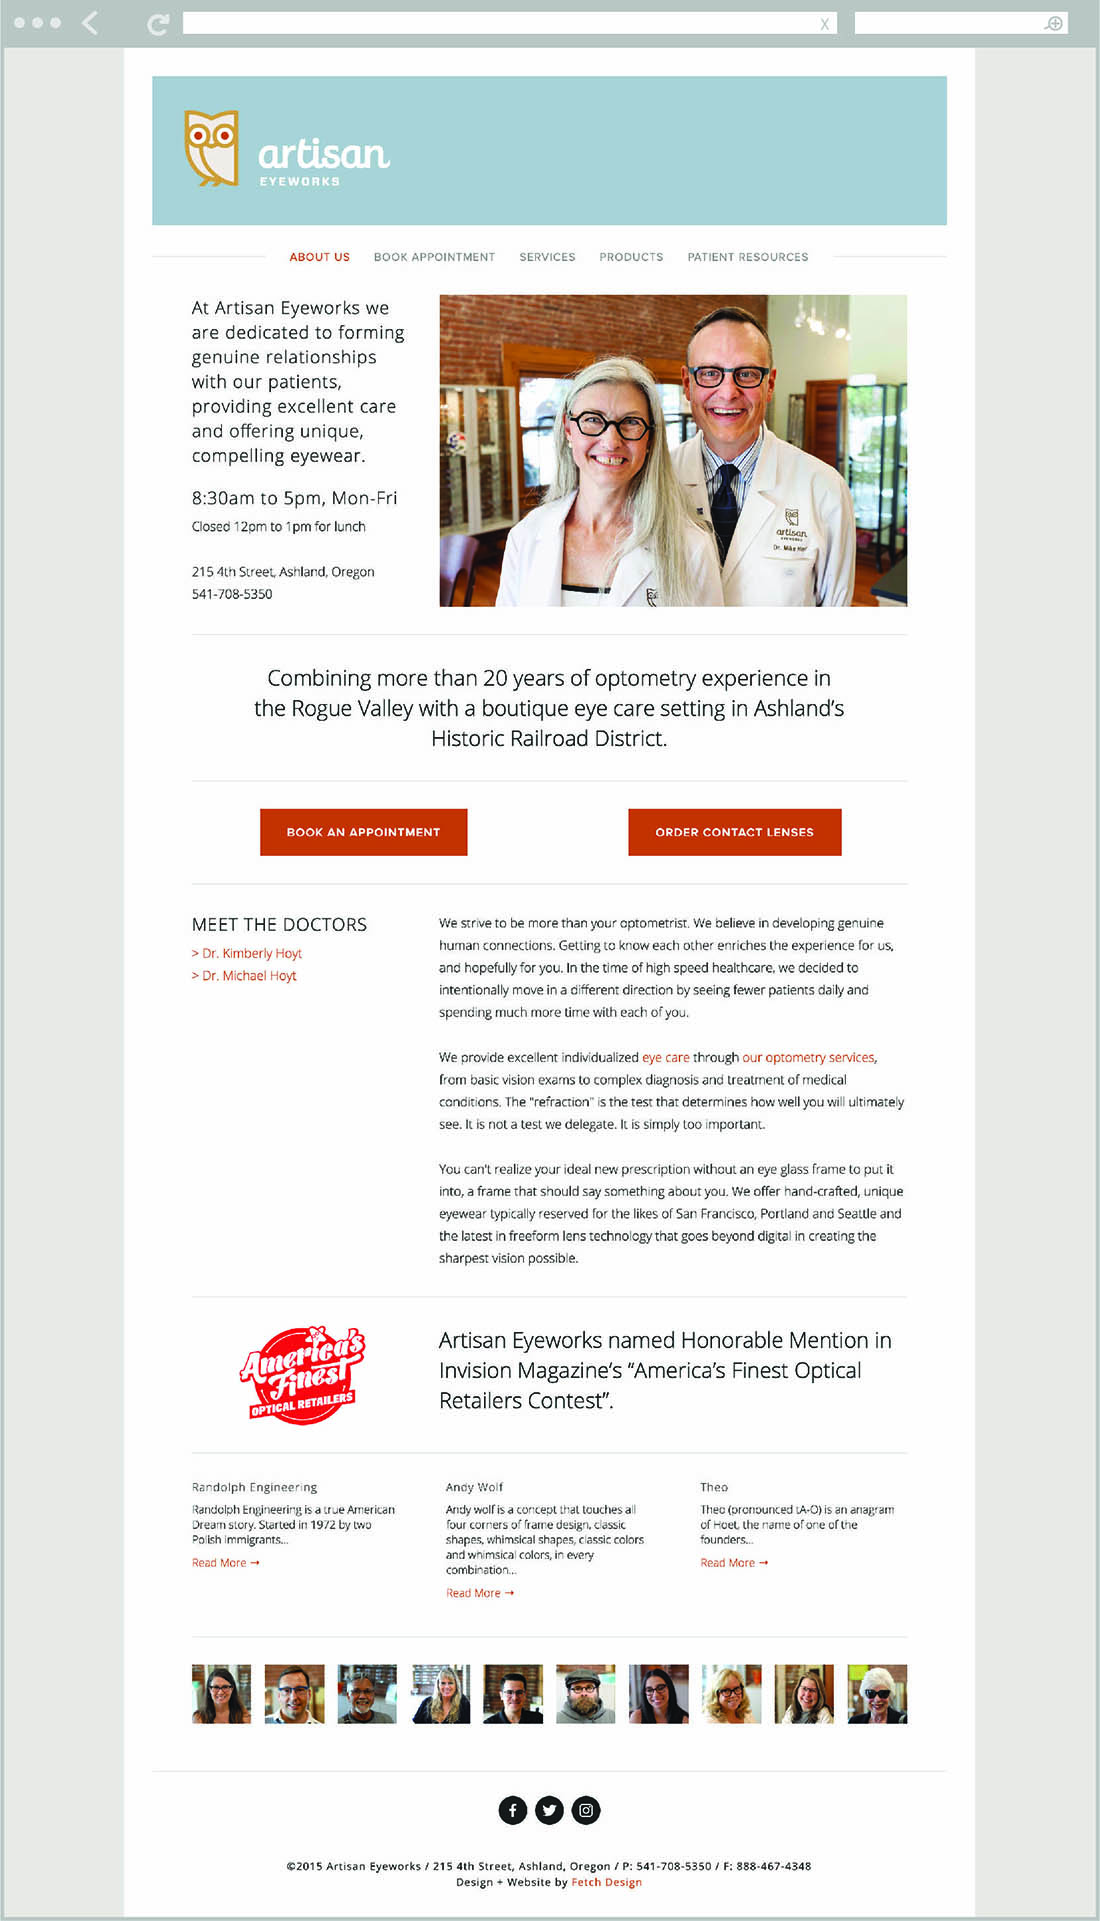 Artisan Eyeworks visual identity and website by Fetch Design, Portland, Oregon.